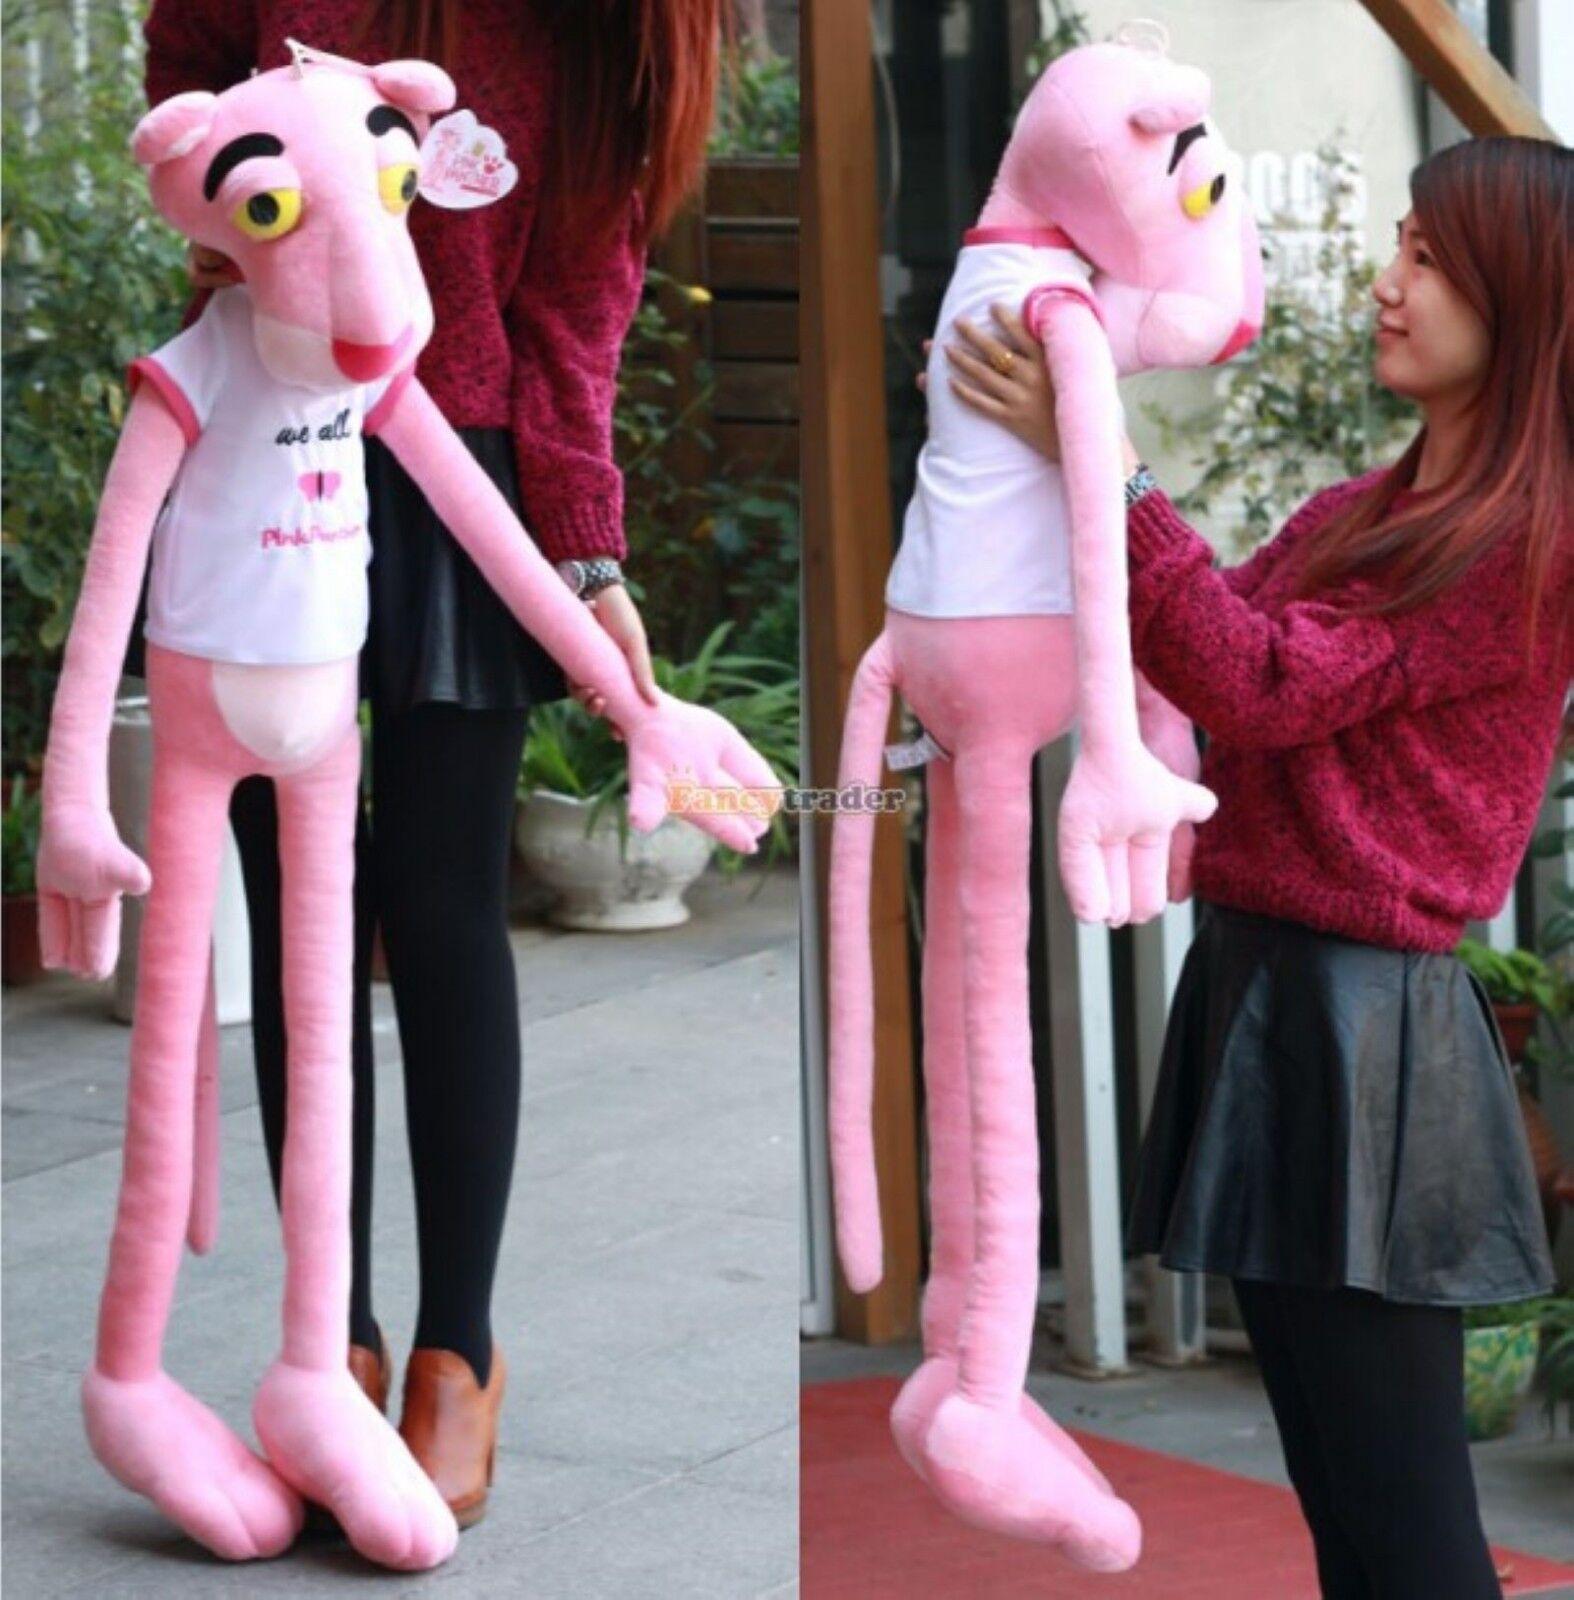 63''Giant Hung big Plush Stuffed Pink animal Life Size soft toys doll Xmas gift